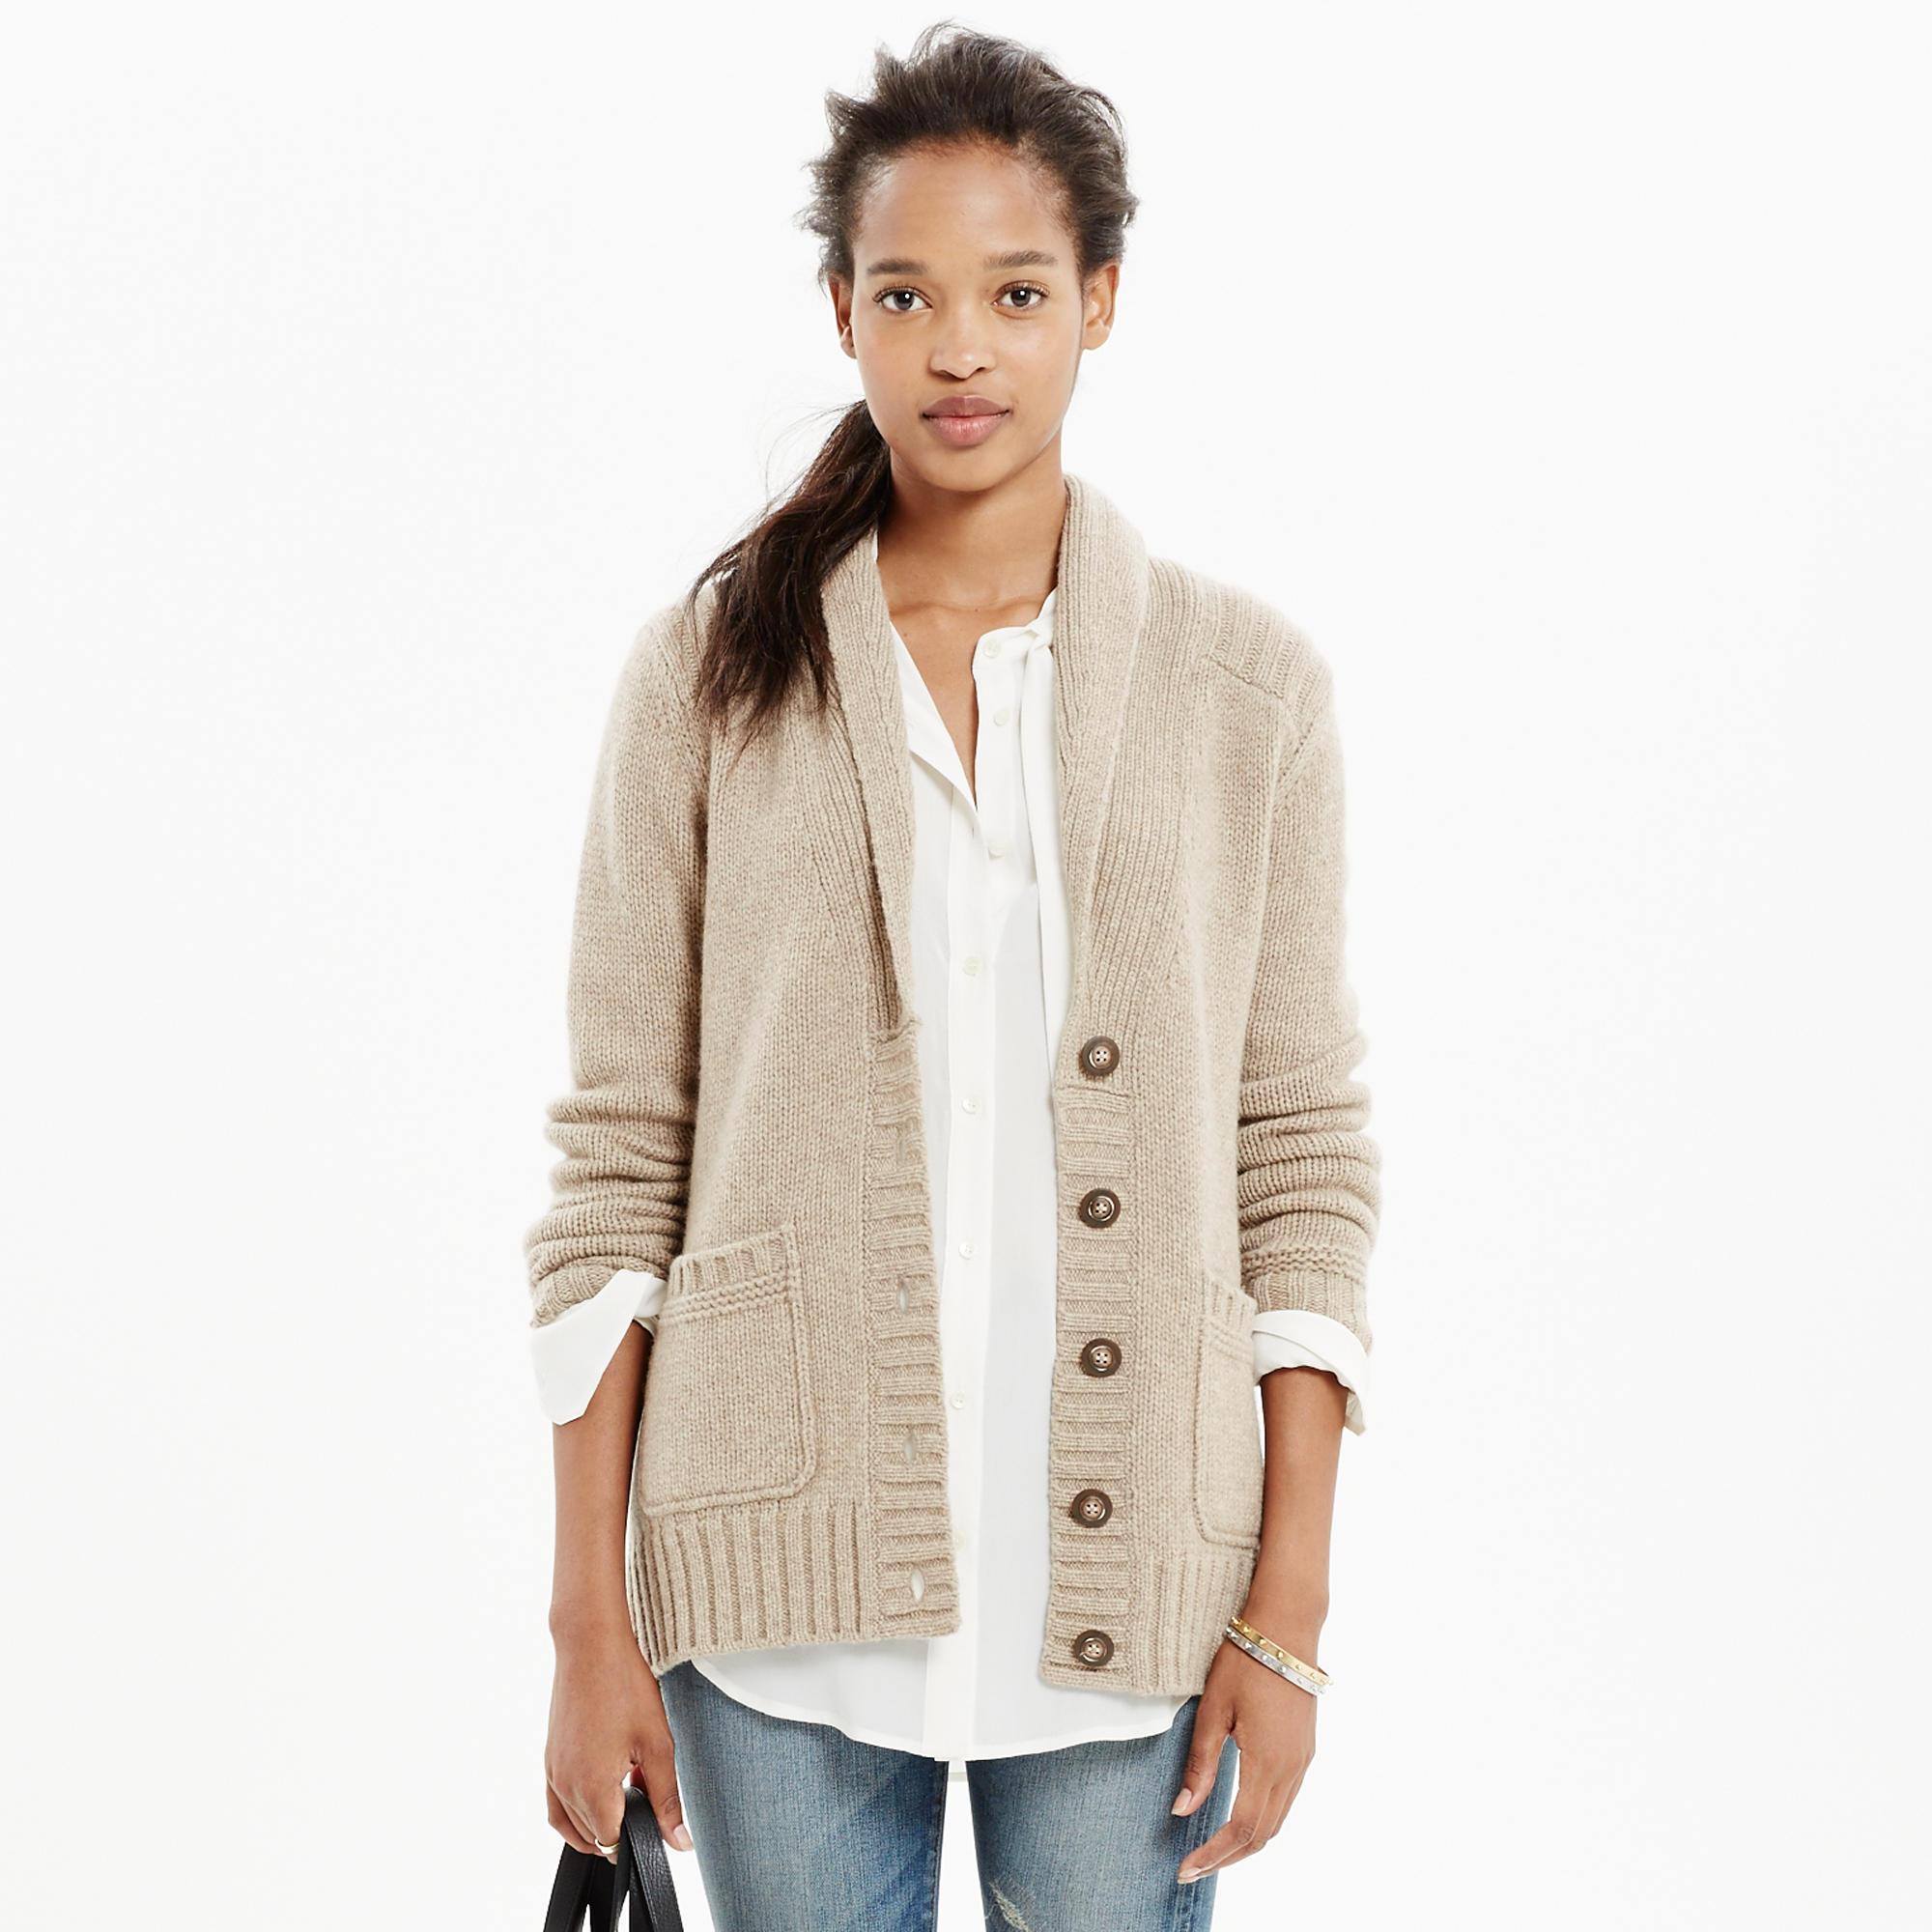 Rib-Collar Cardigan : cardigans & sweater-jackets | Madewell